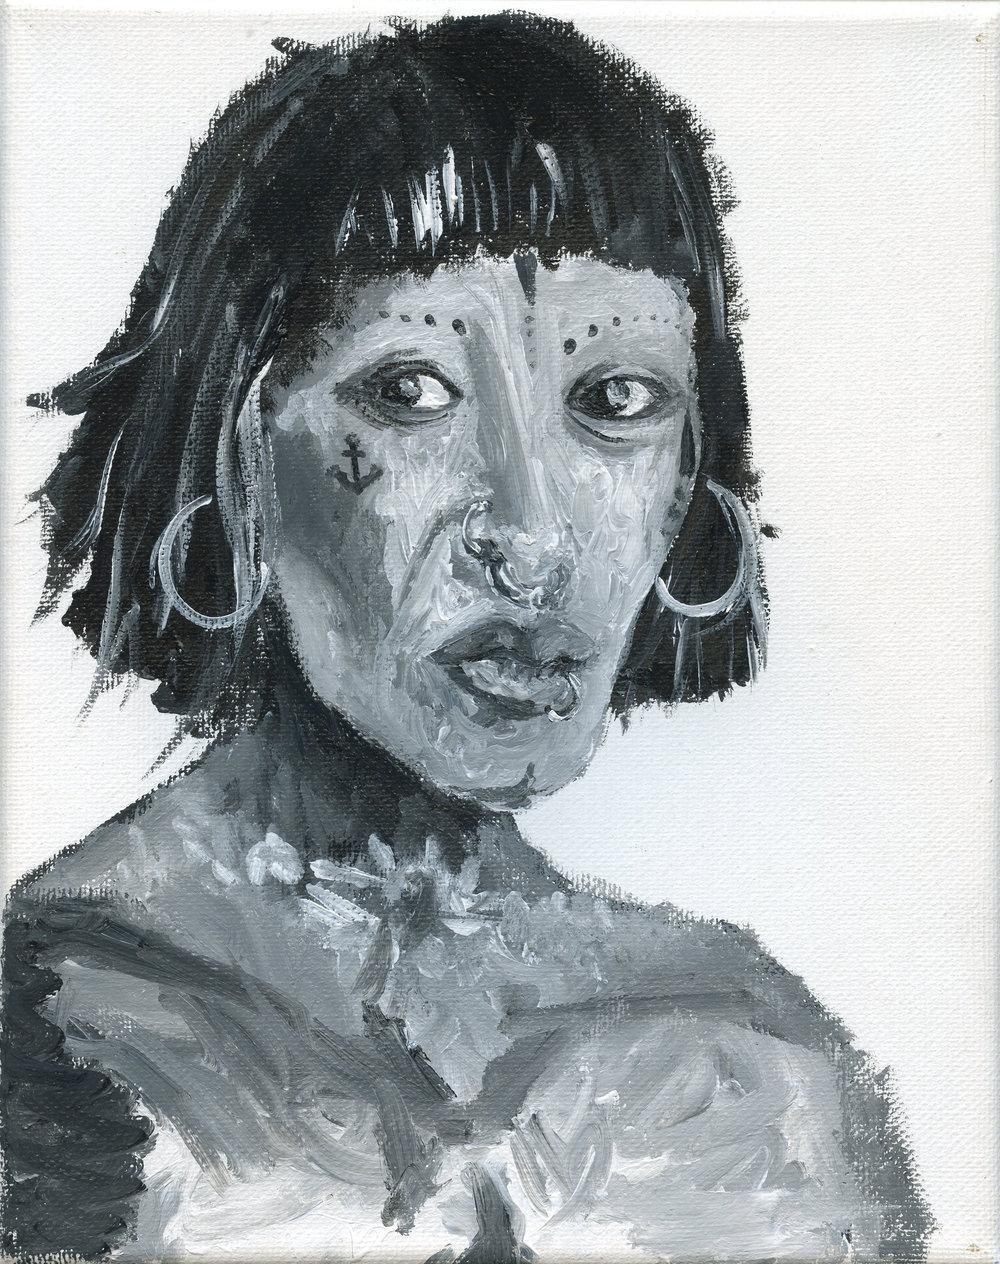 Black & White Acrylic Study